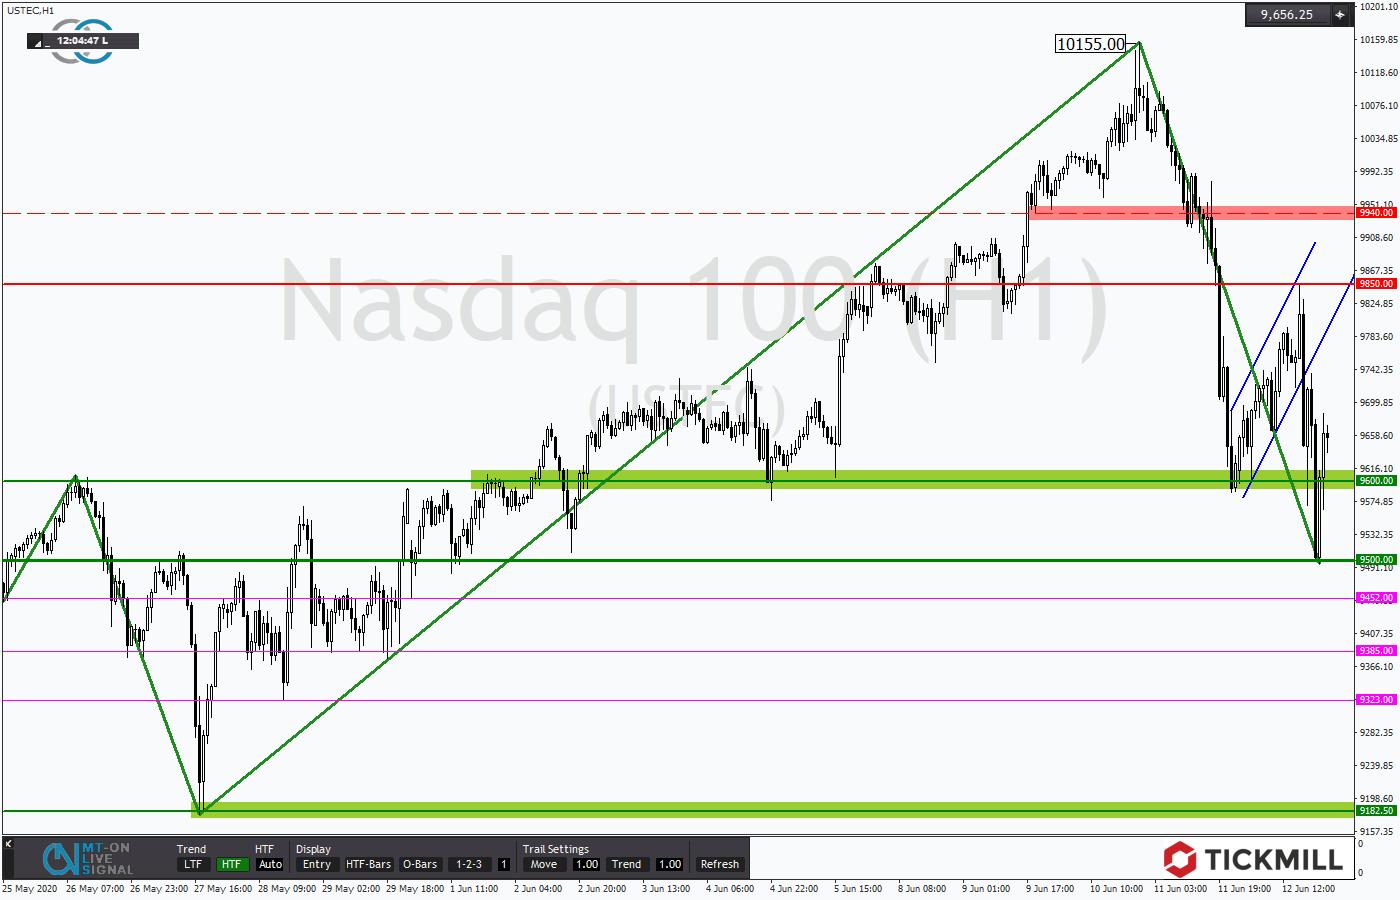 Tickmill-Analyse: NASDAQ im Korrekturmodus